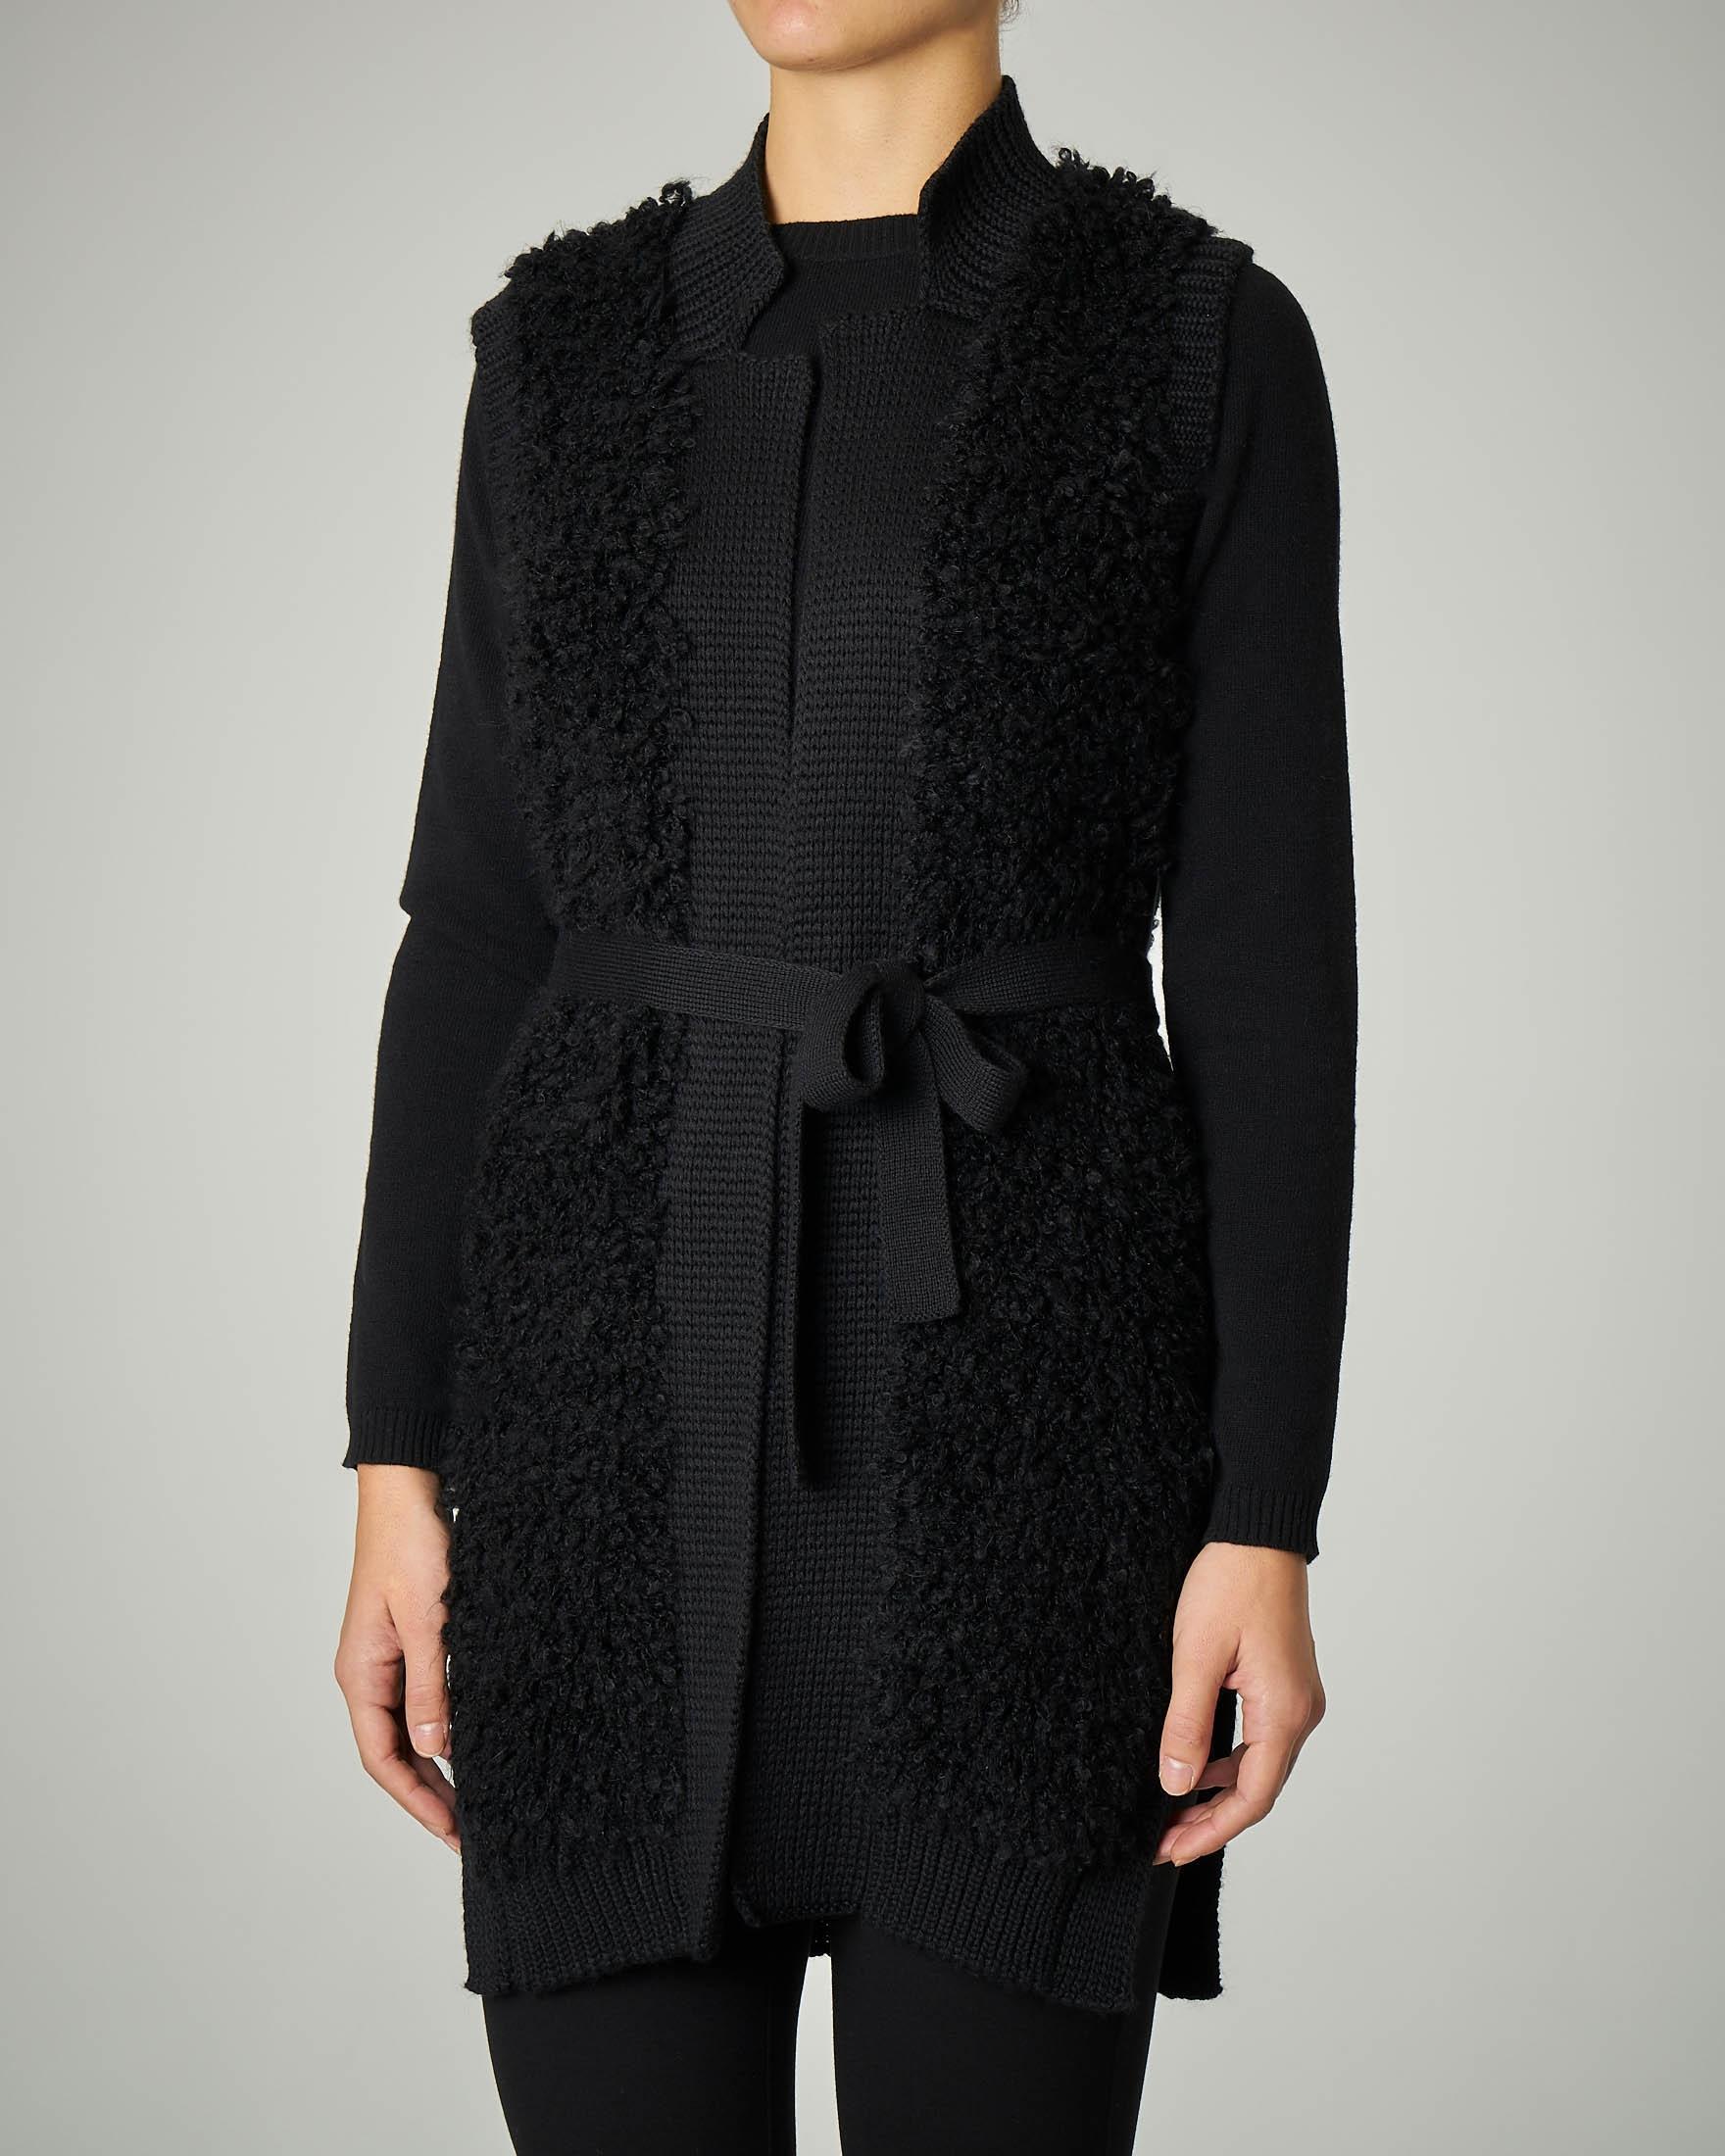 Gilet nero in lana bouclè